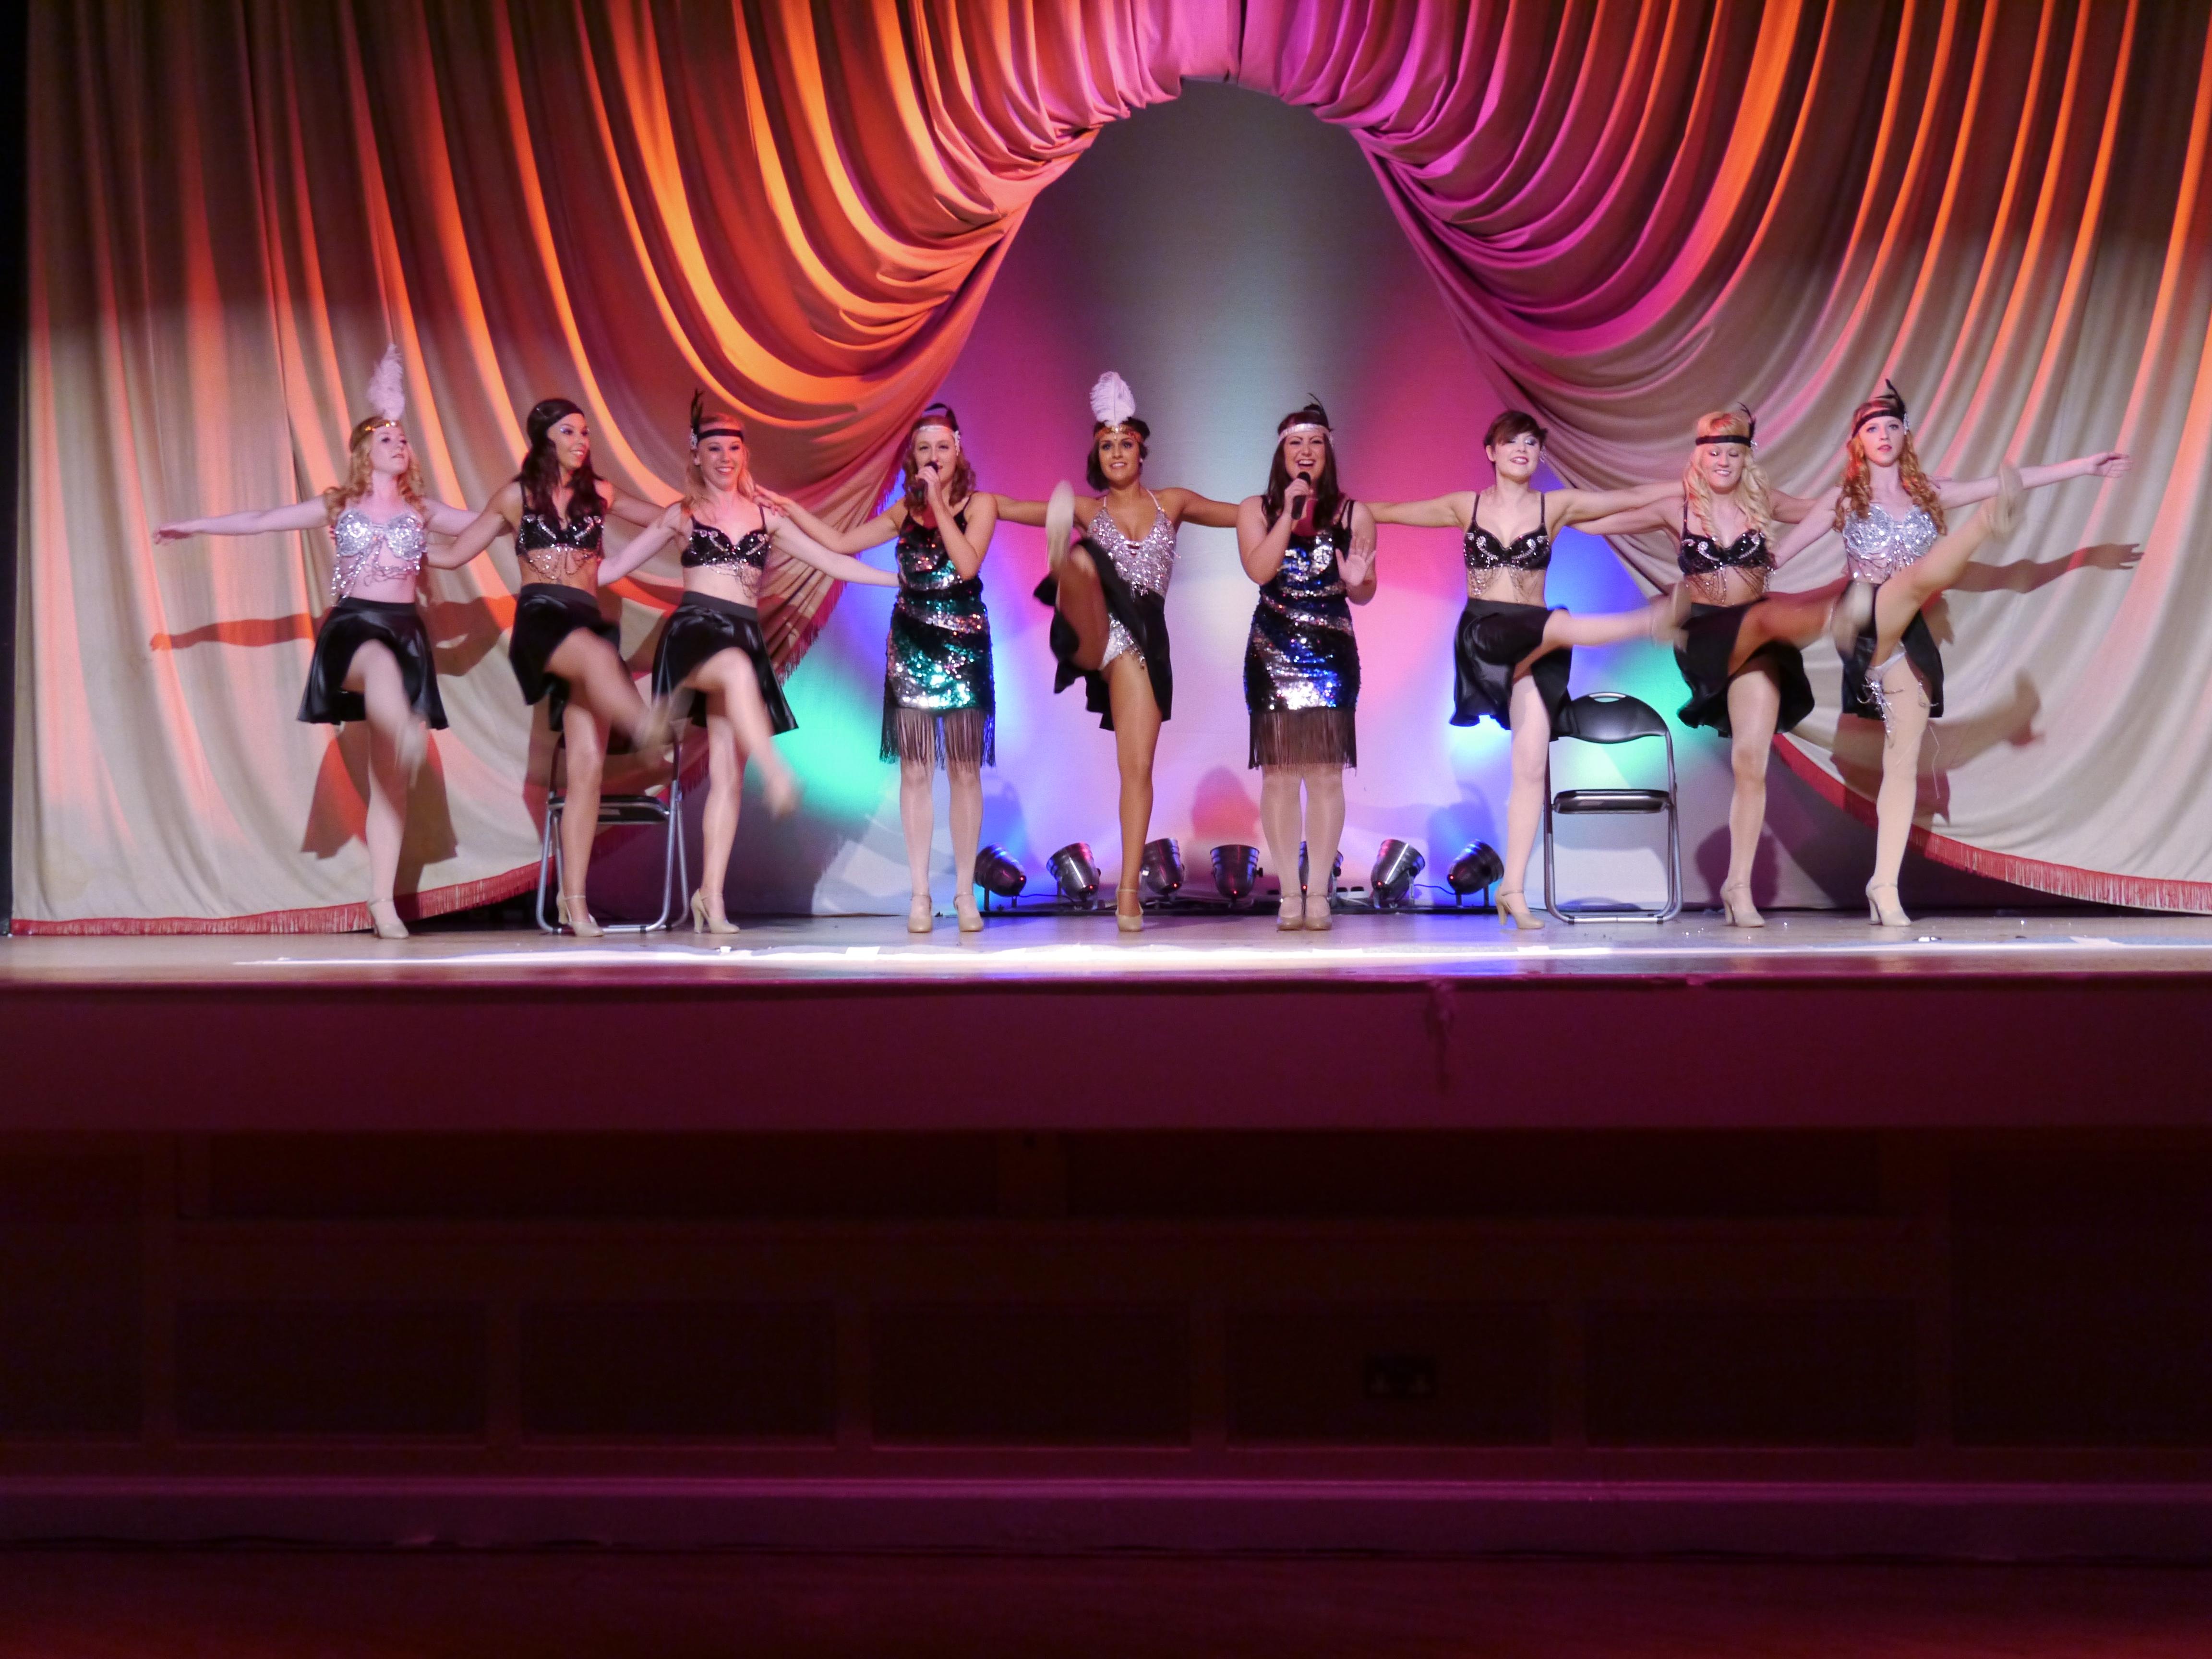 Dancers_023